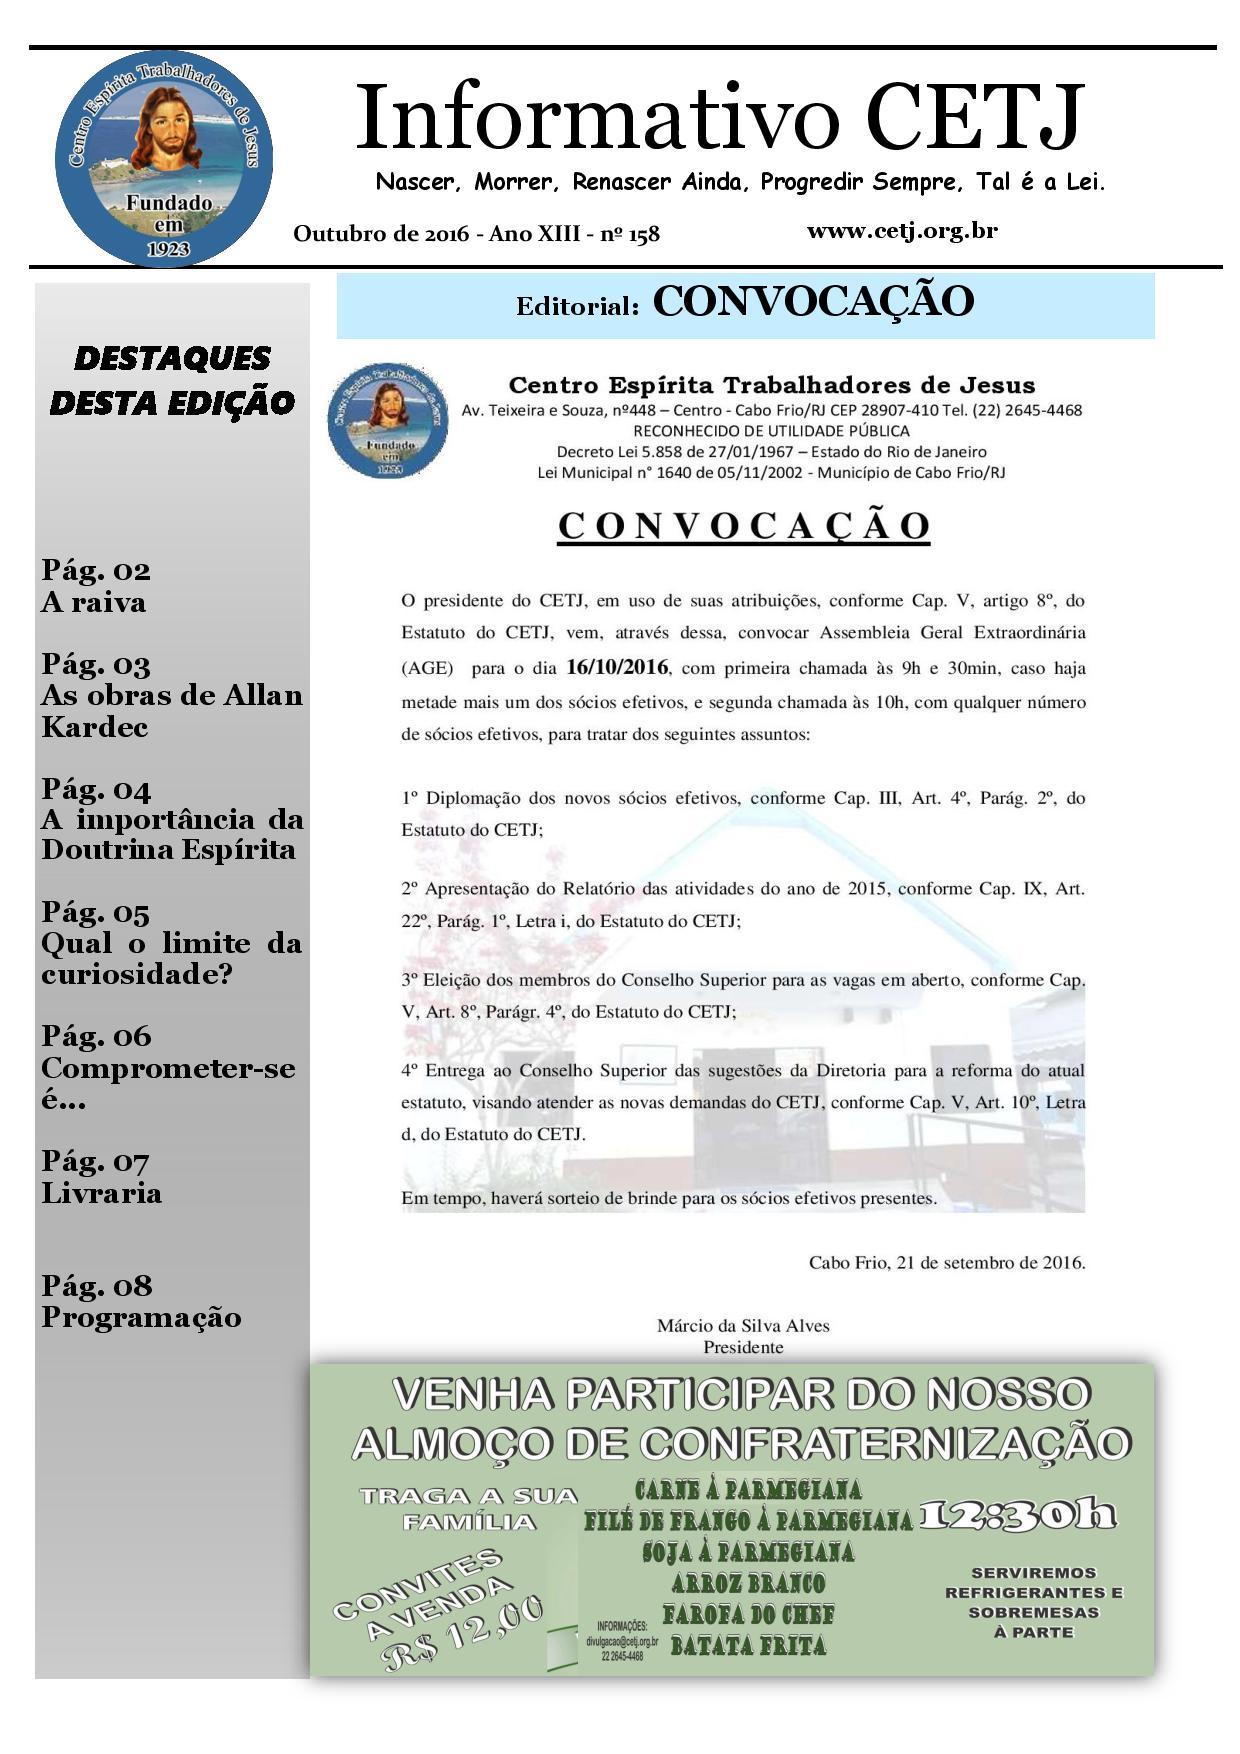 informativo-outubro-de-2016_net-page-001